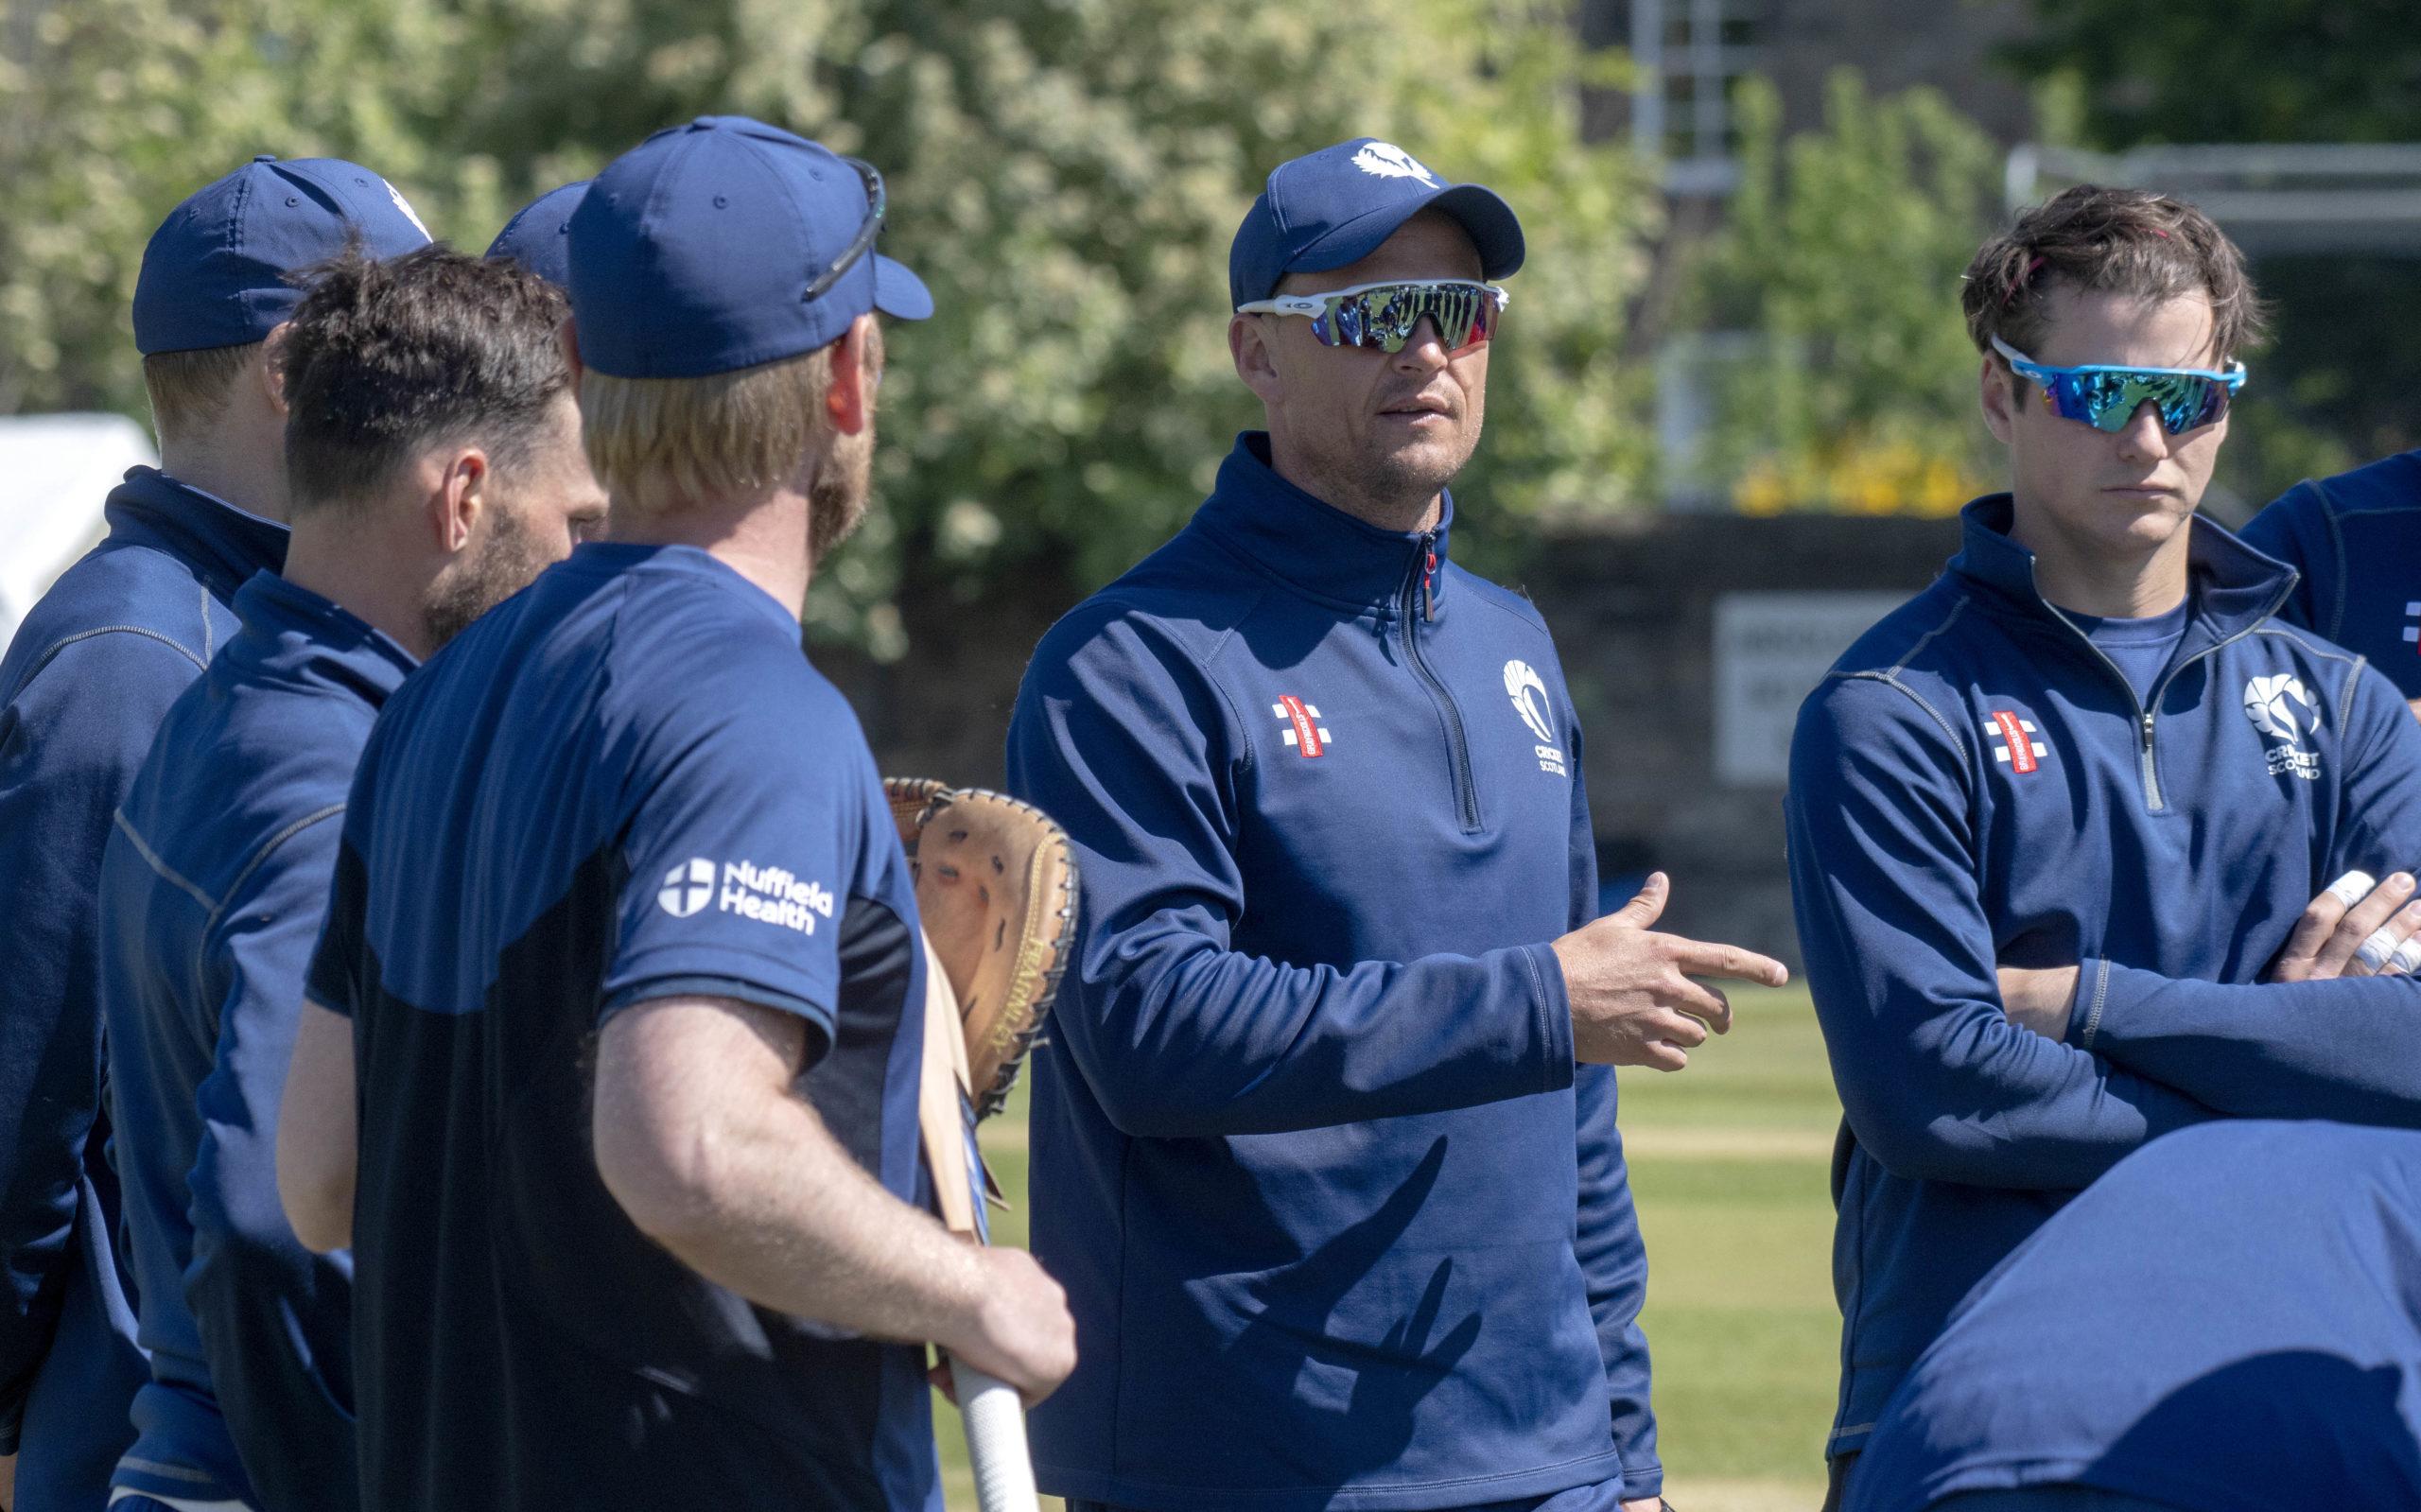 Cricket Scotland: Shane Burger - It's good to be back